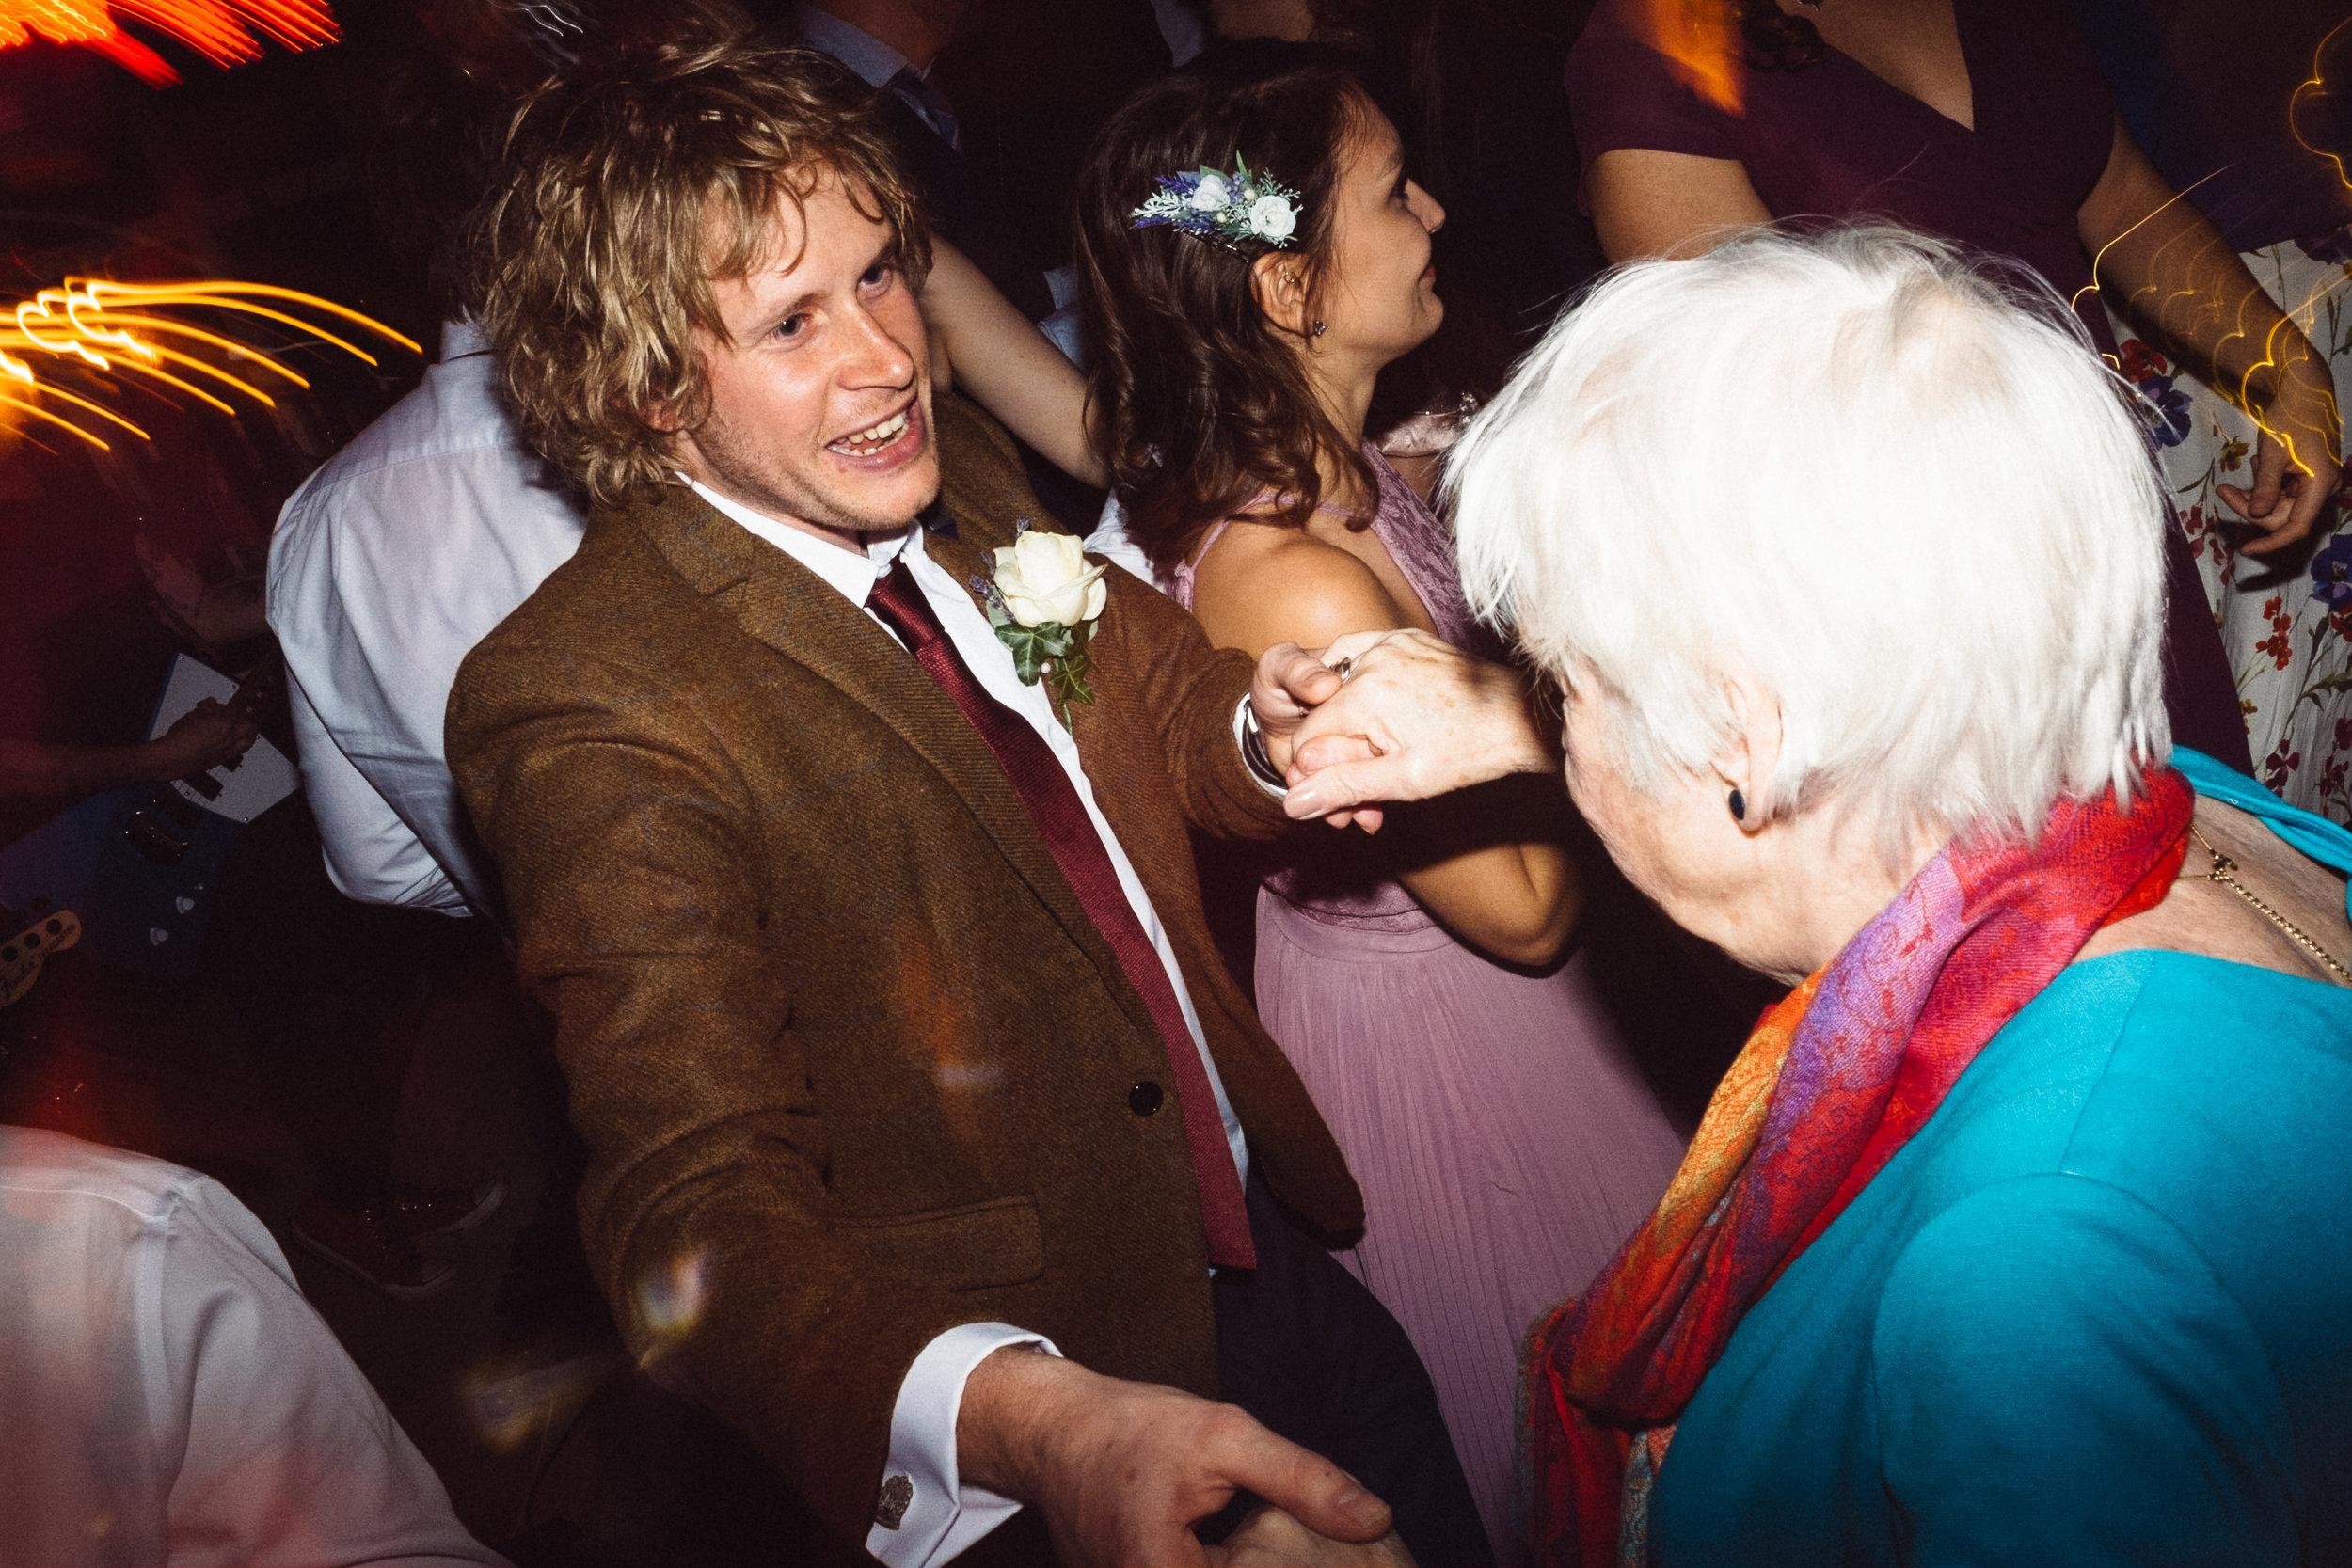 Hereford_wedding_photographer54.jpg